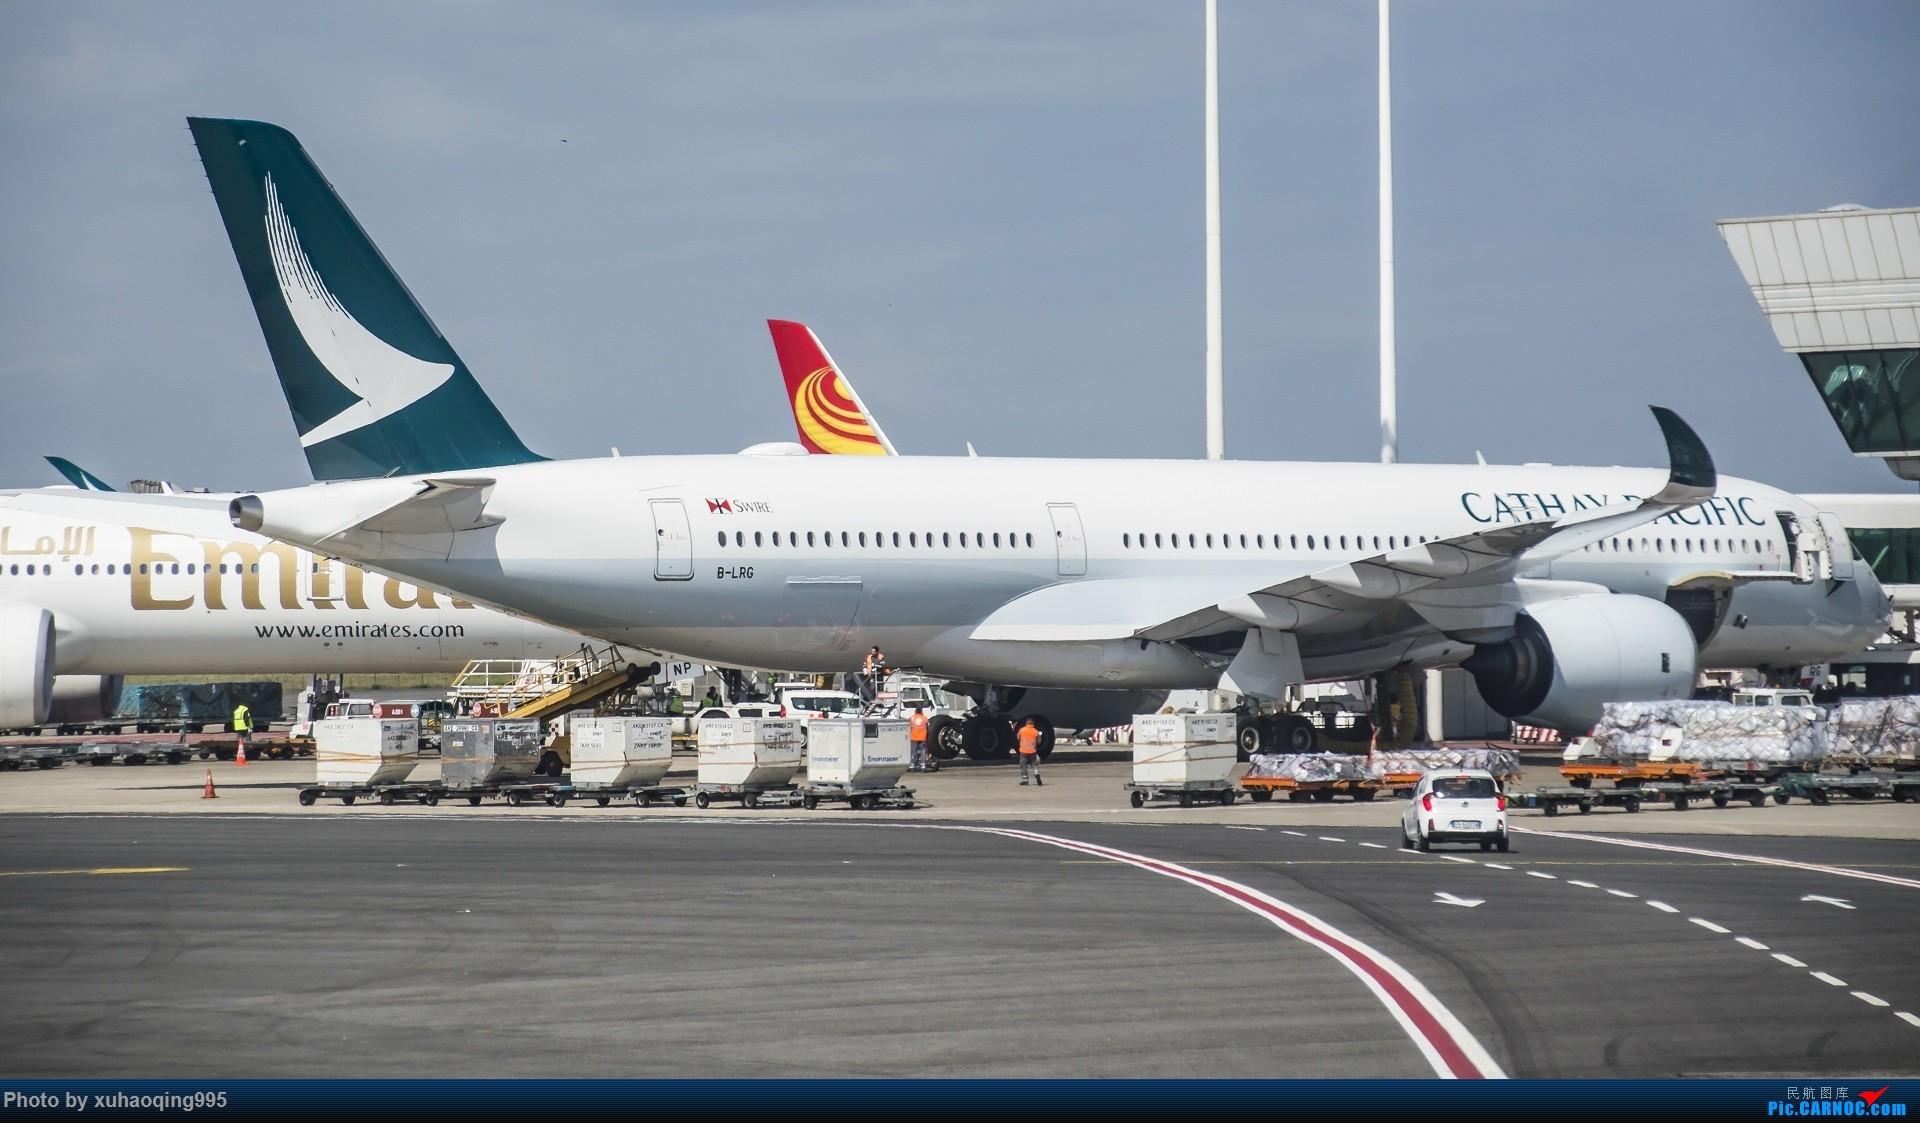 Re:[原创]罗马机场(FCO)拍机 AIRBUS A350-900 B-LRG 意大利菲乌米奇诺机场